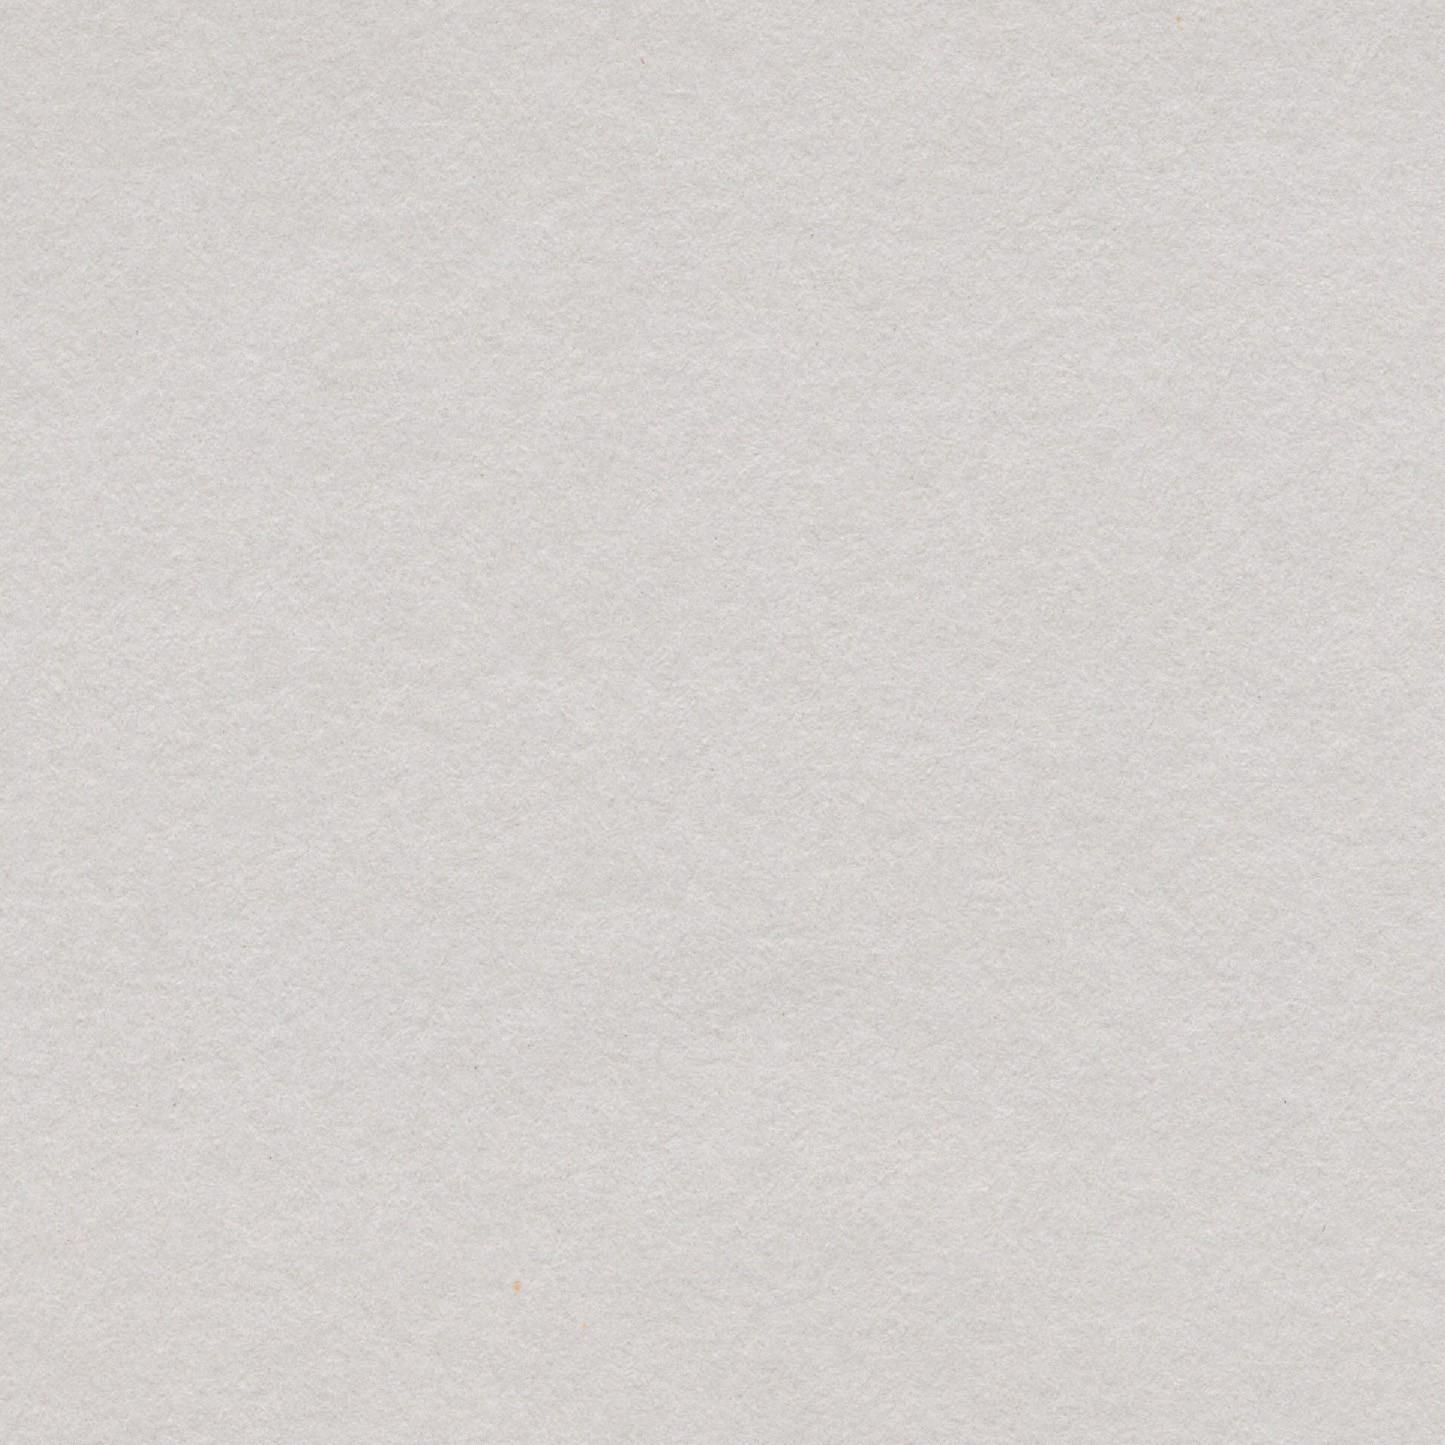 Grey - Pale 150gsm